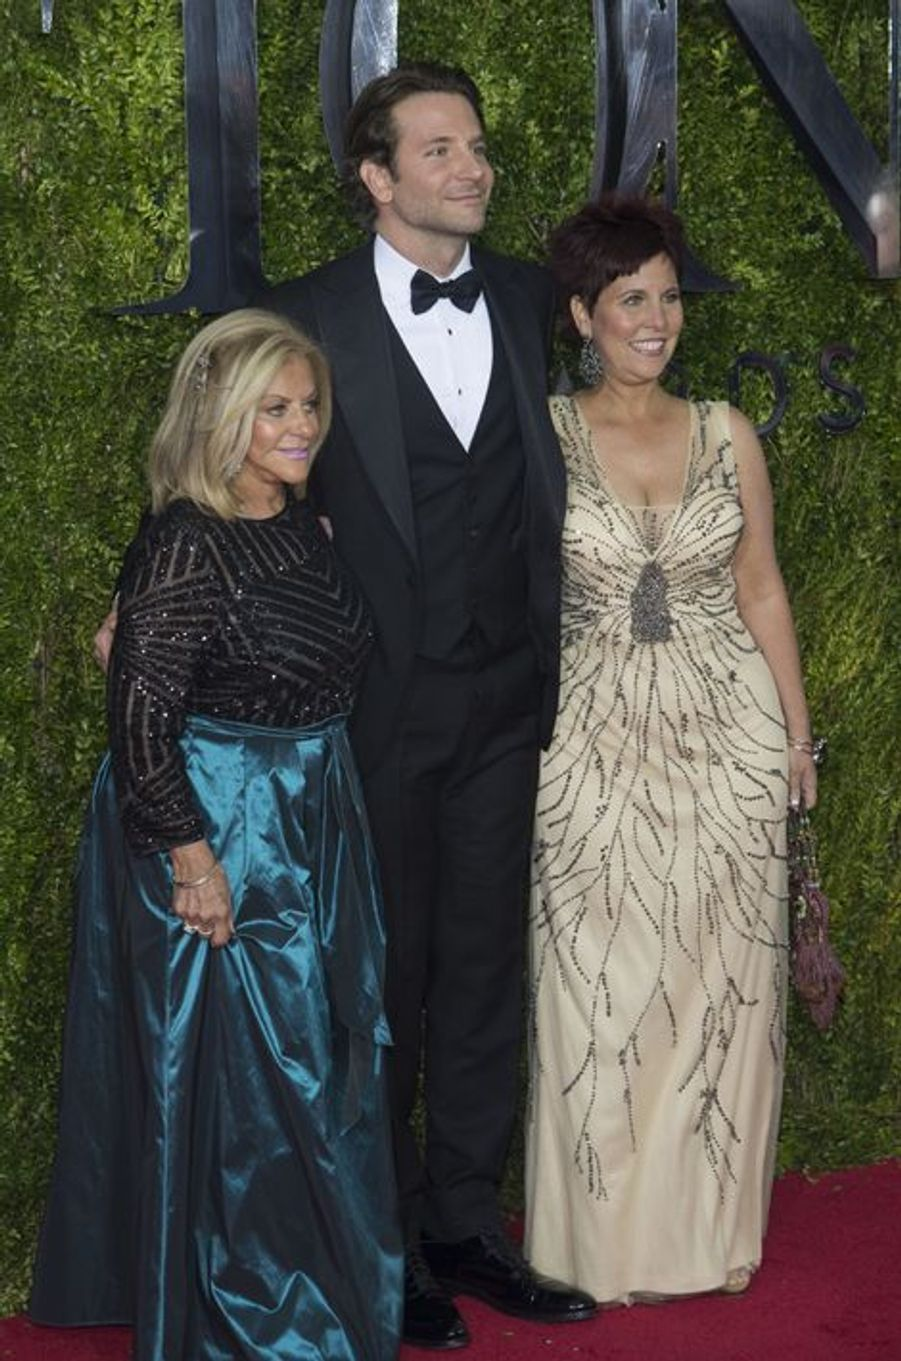 Bradley Cooper aux côtés de sa mère Gloria Campano et sa soeur Holly Cooper